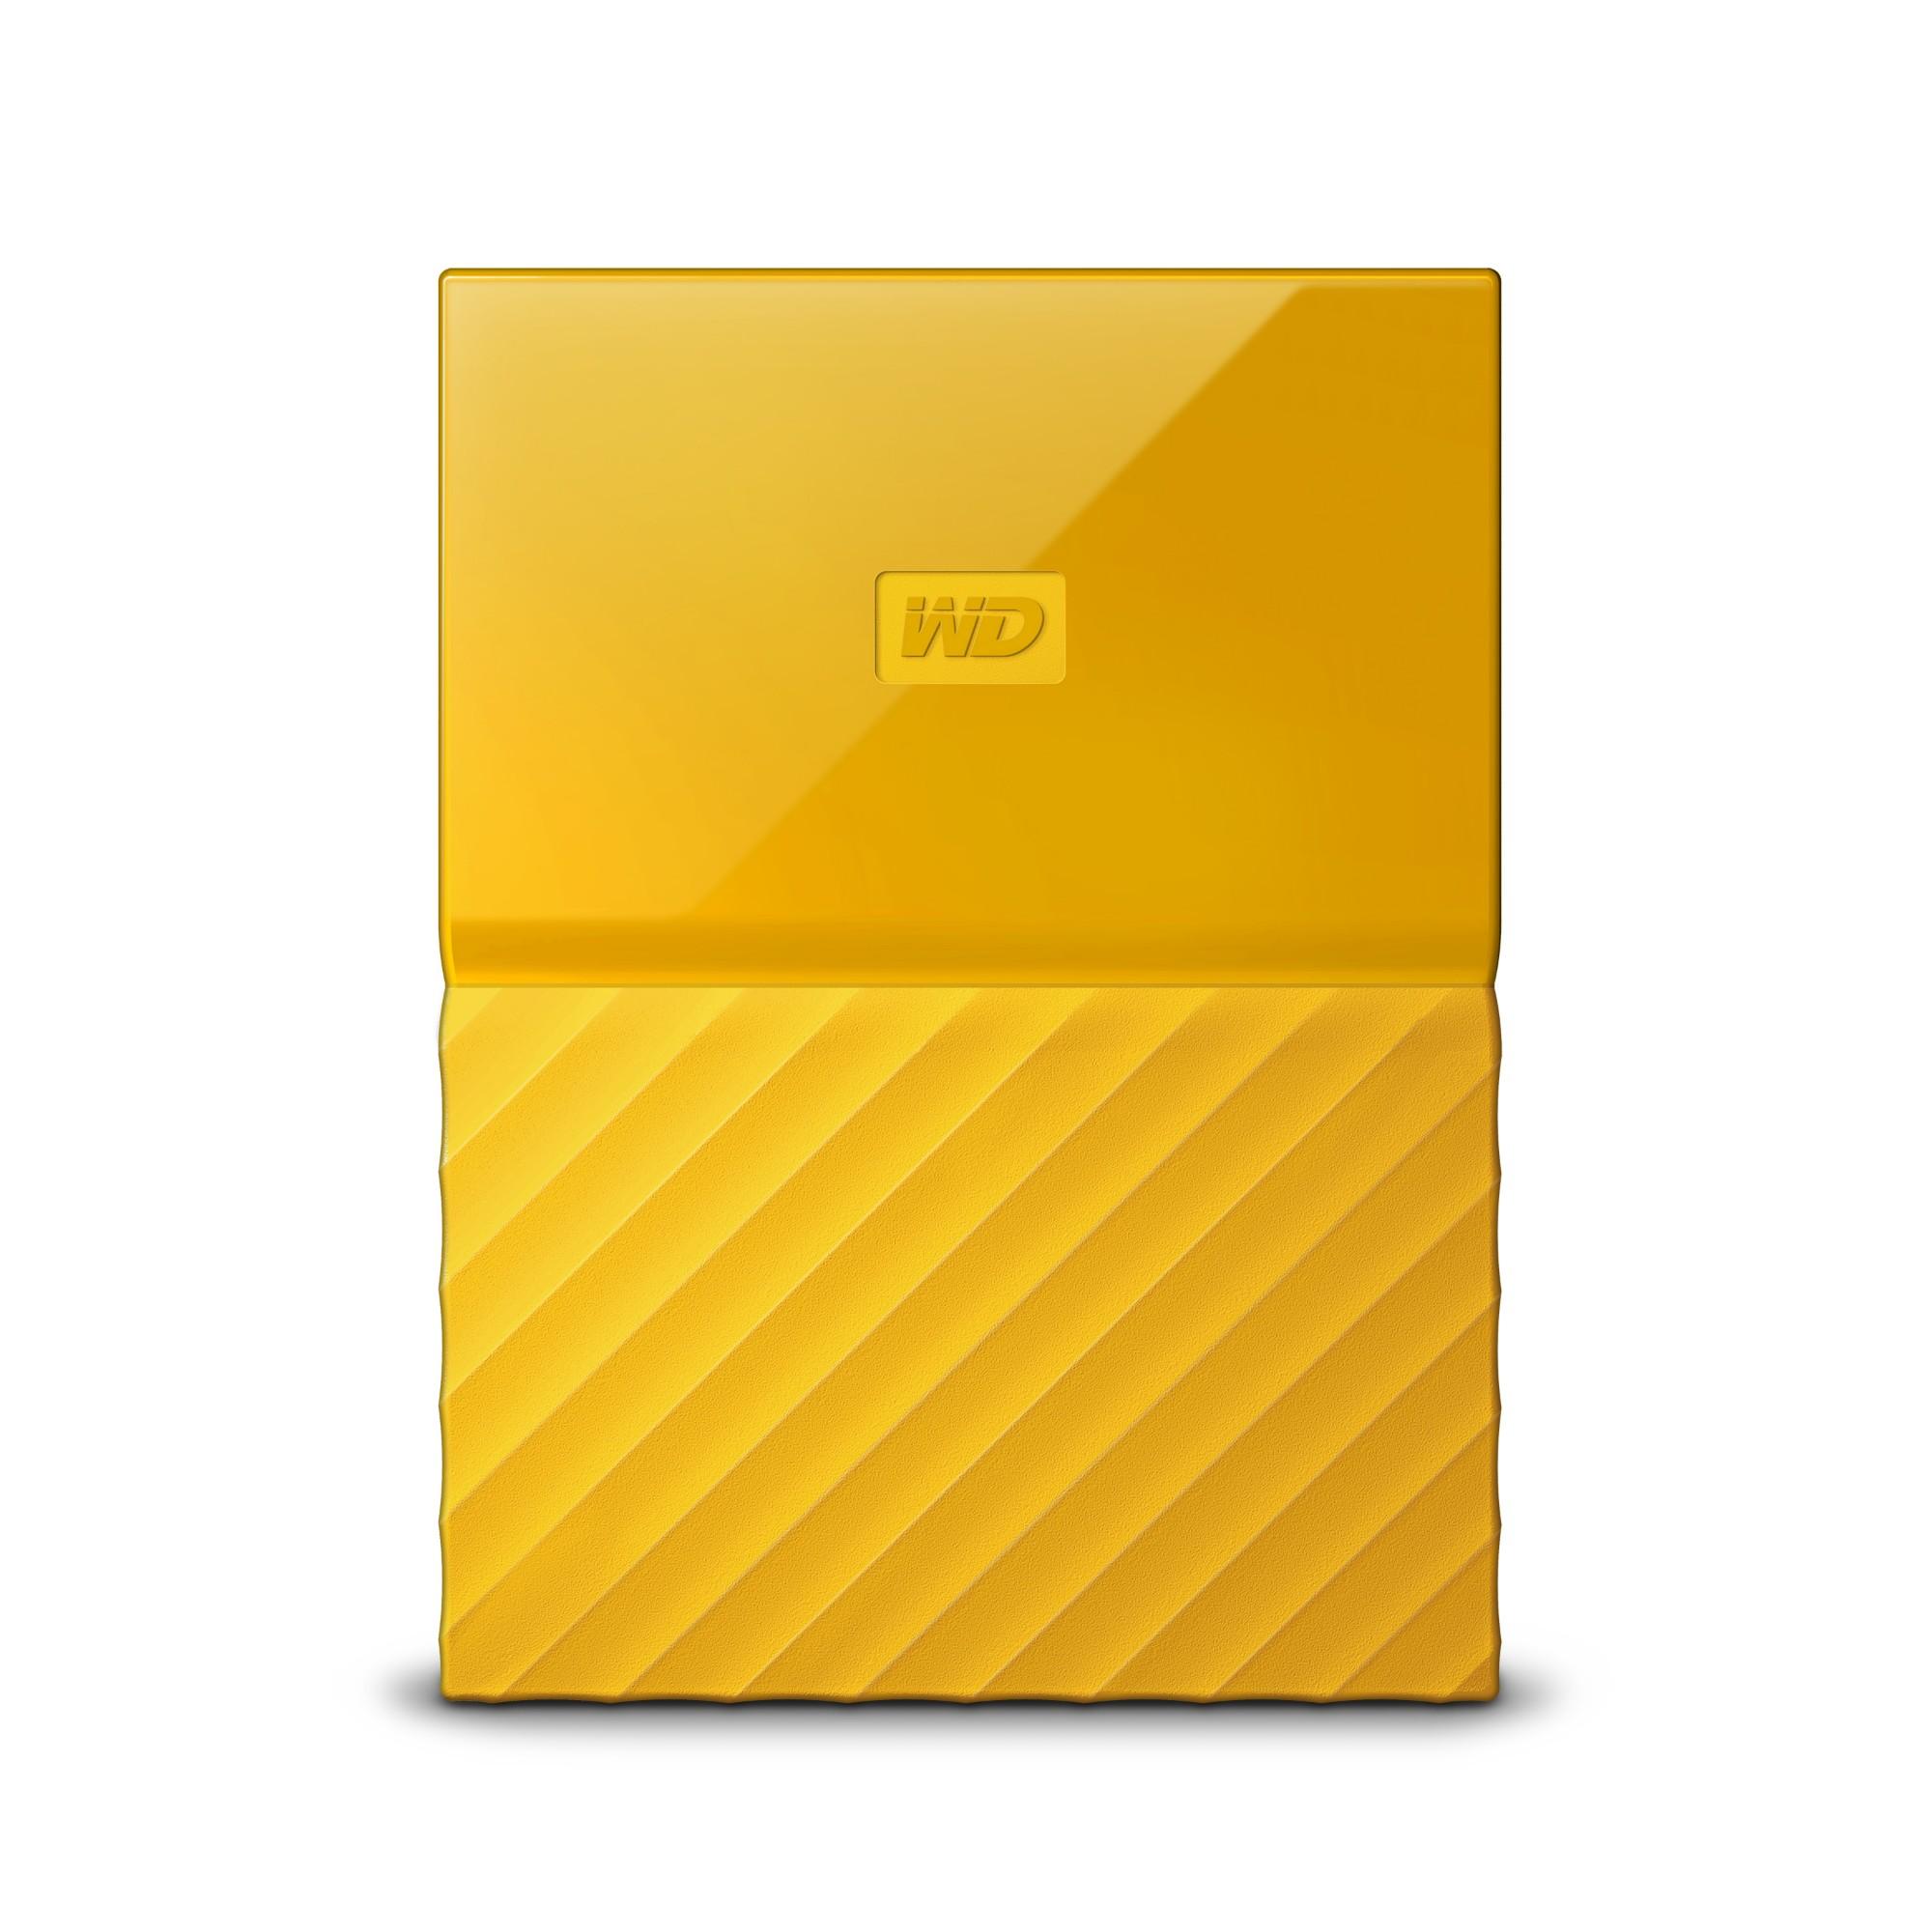 Western Digital My Passport external hard drive 1000 GB Yellow